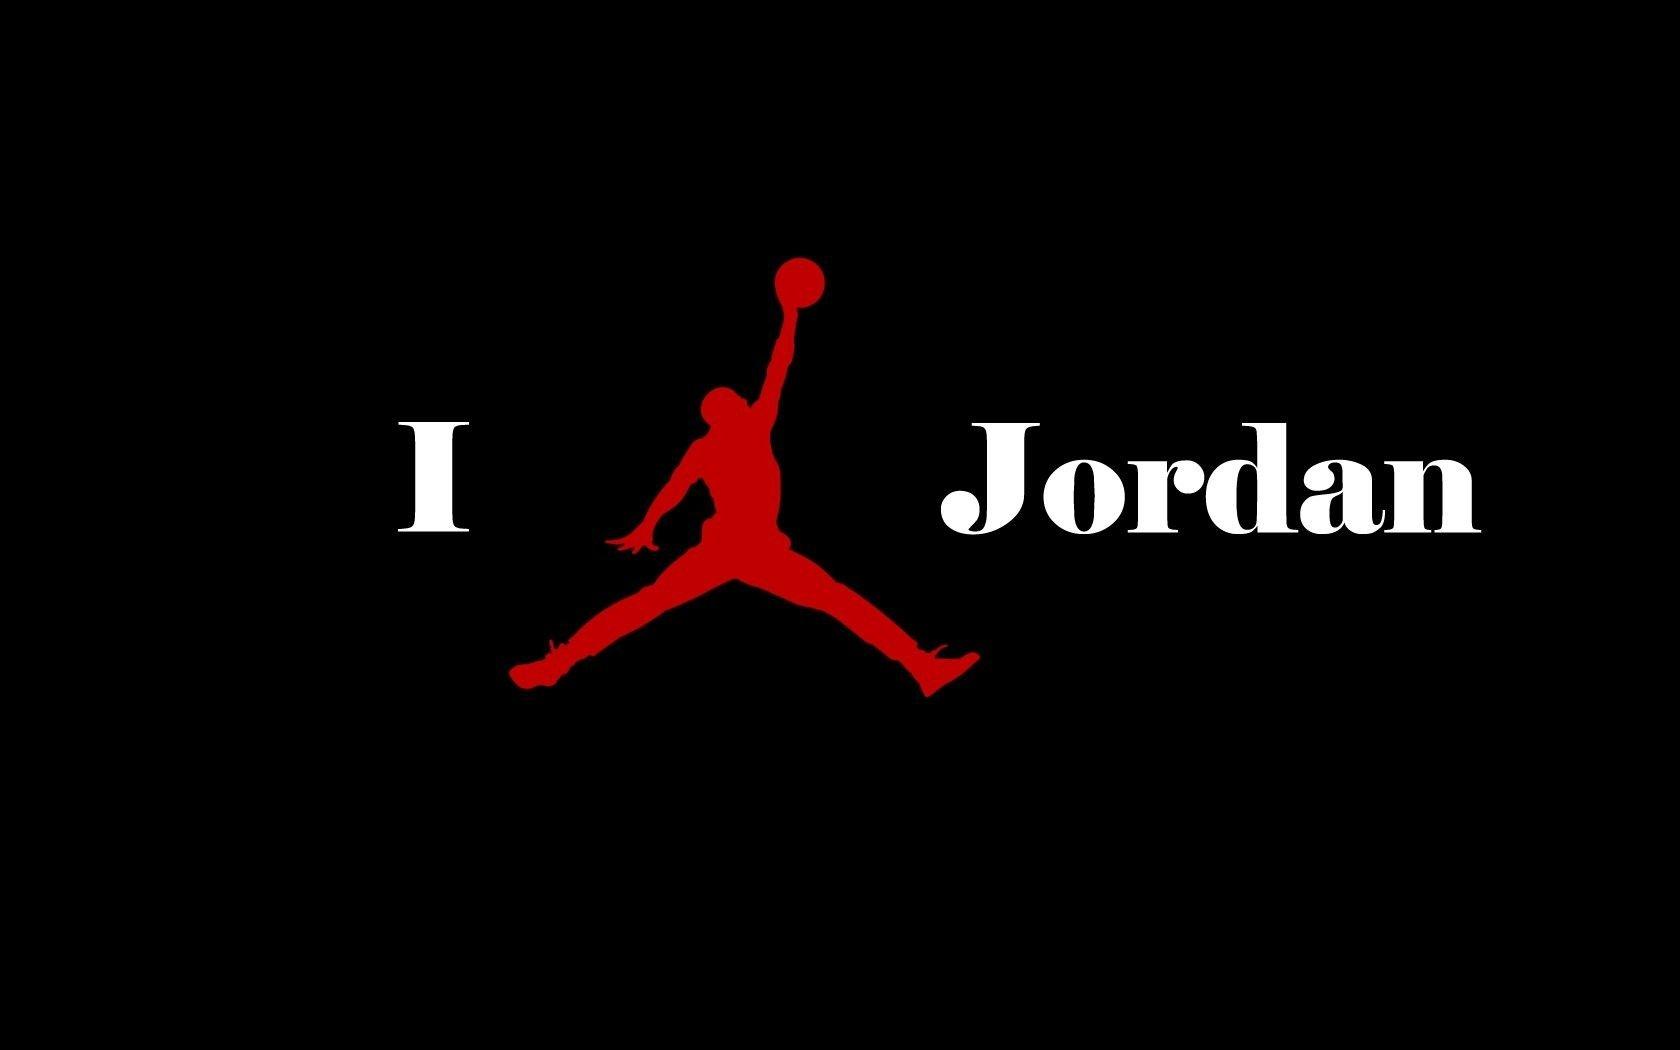 Best Wallpaper Logo Jordan - thumb-1920-688492  Graphic_514854.jpg